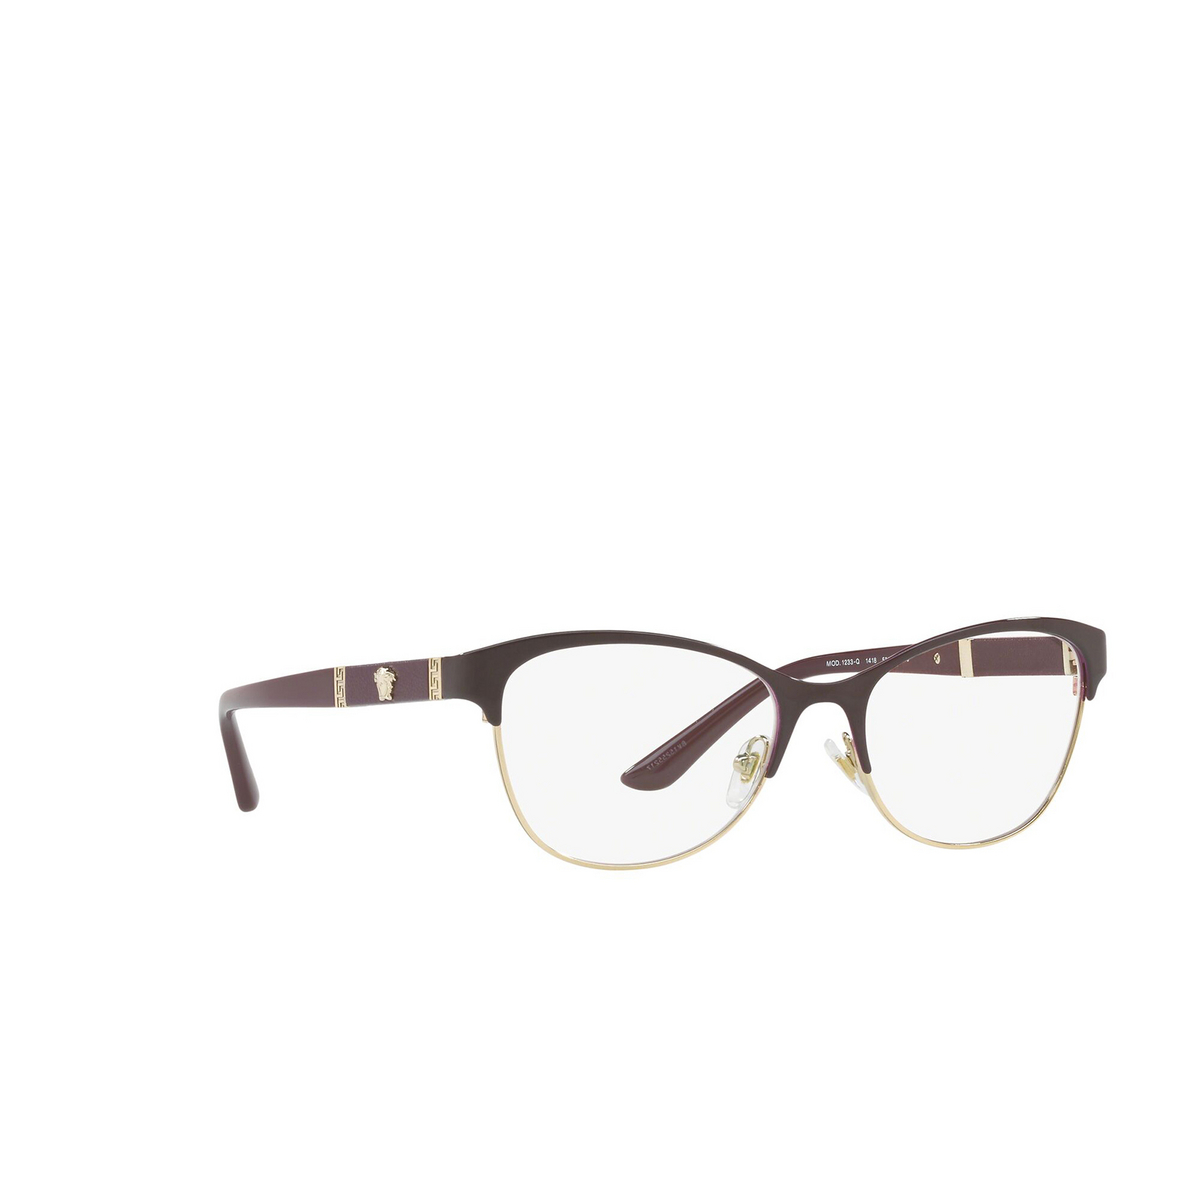 Versace® Cat-eye Eyeglasses: VE1233Q color Violet / Gold 1418 - three-quarters view.